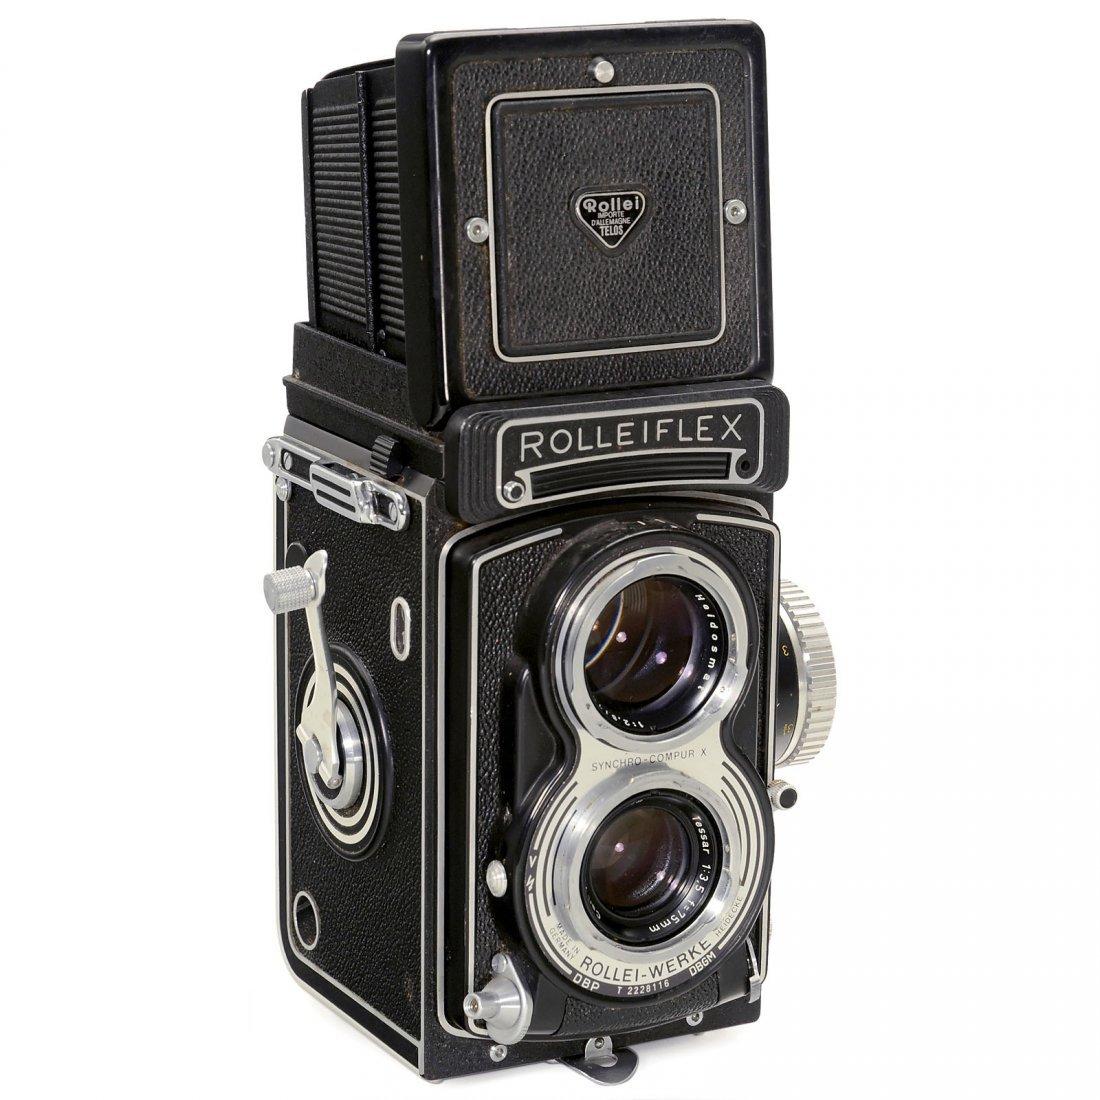 Rolleiflex T, 3rd Model, 1966